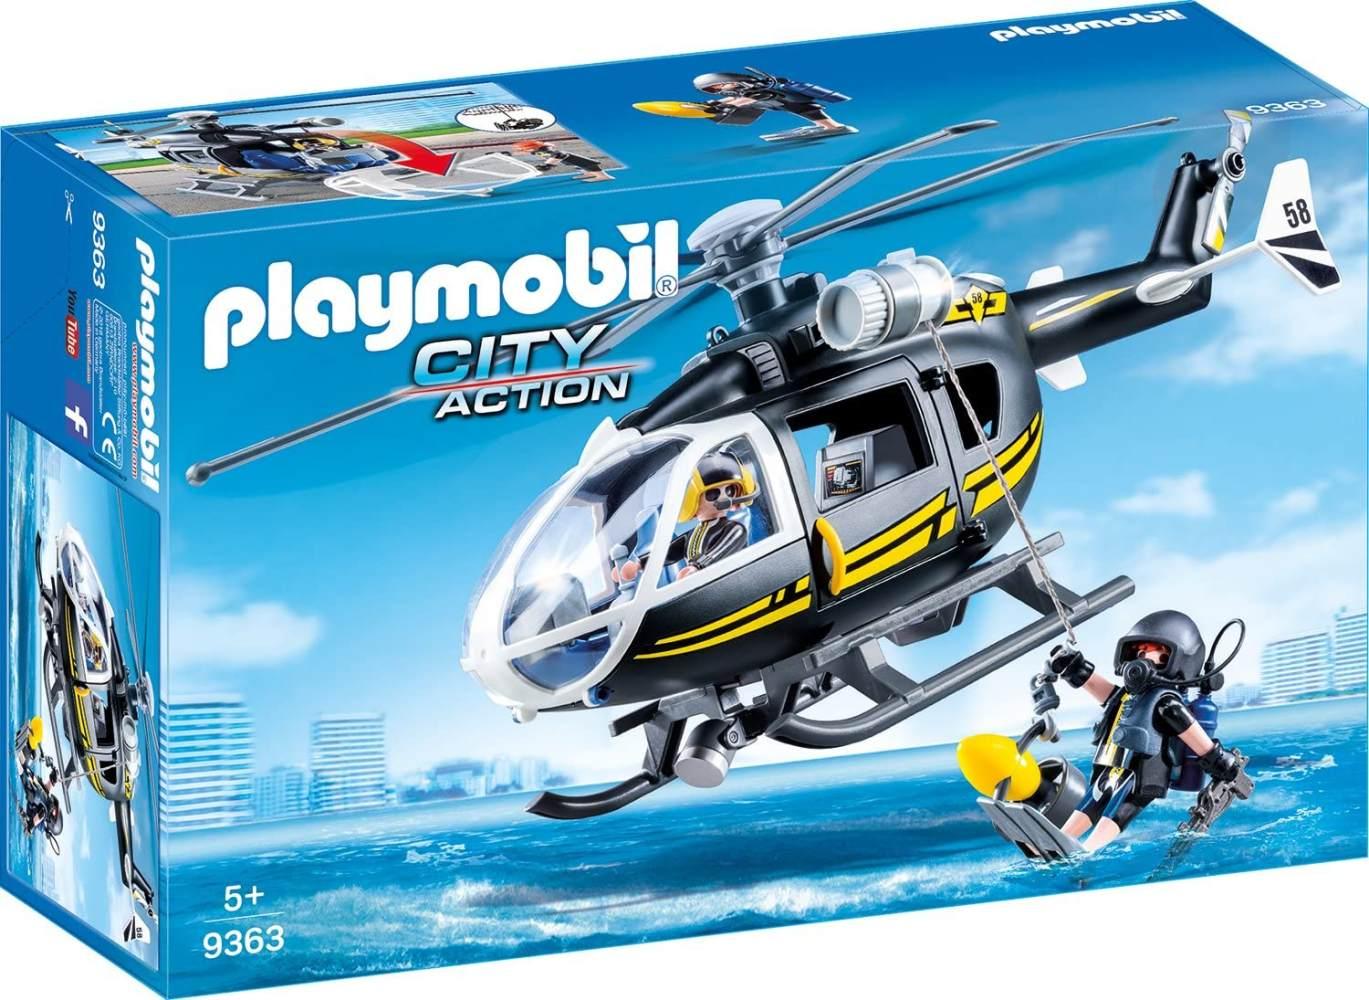 Playmobil 9363 - SEK-Helikopter Spiel Bild 1